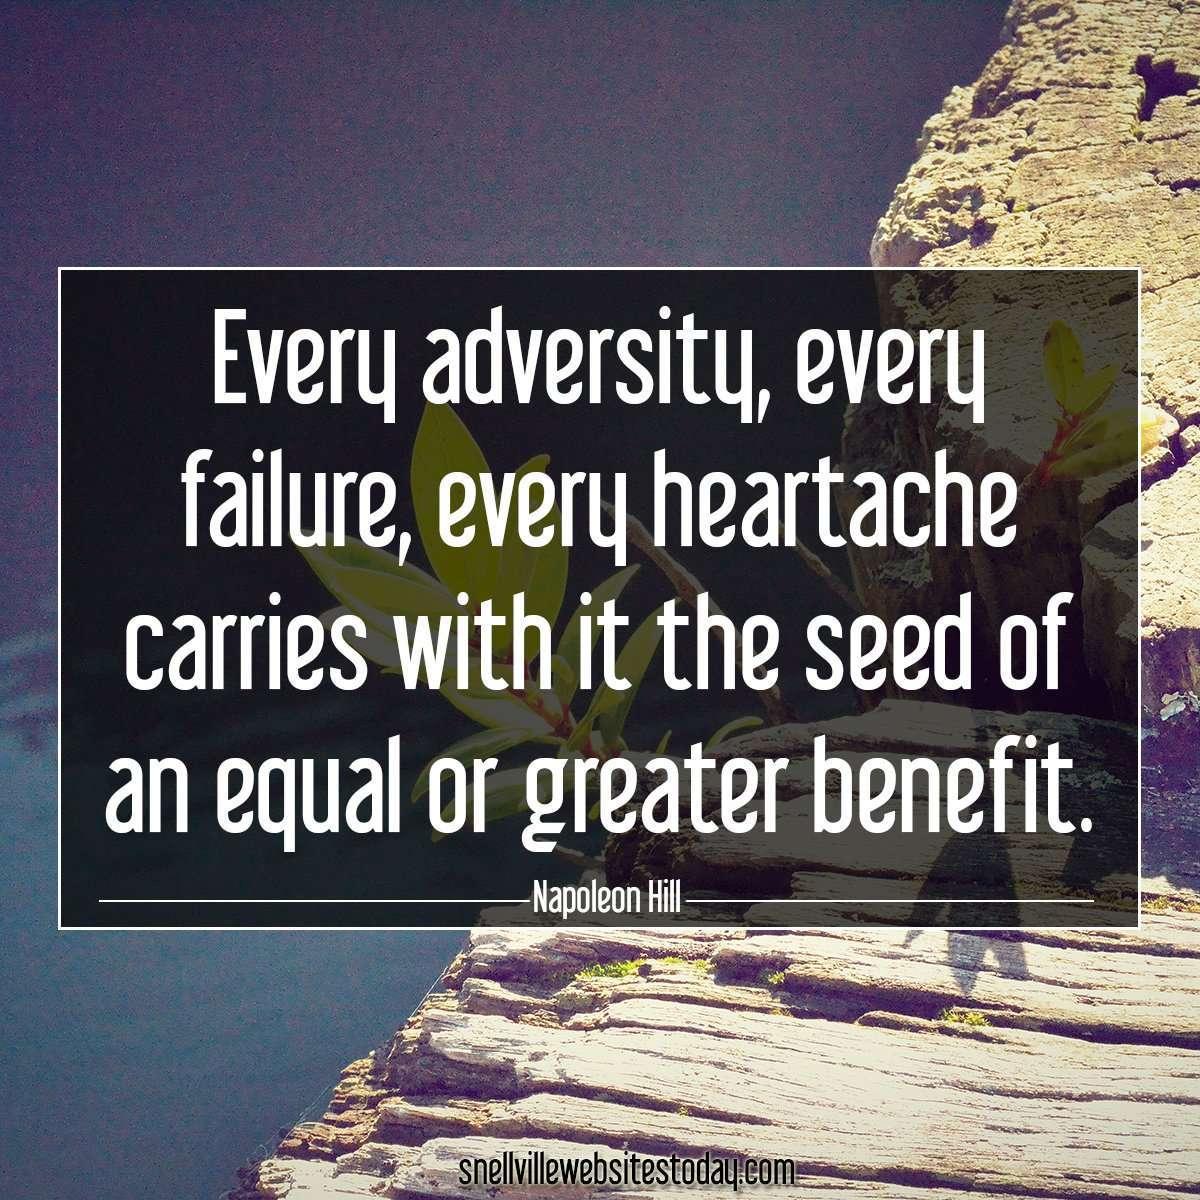 Website design - Every adversity, every failure